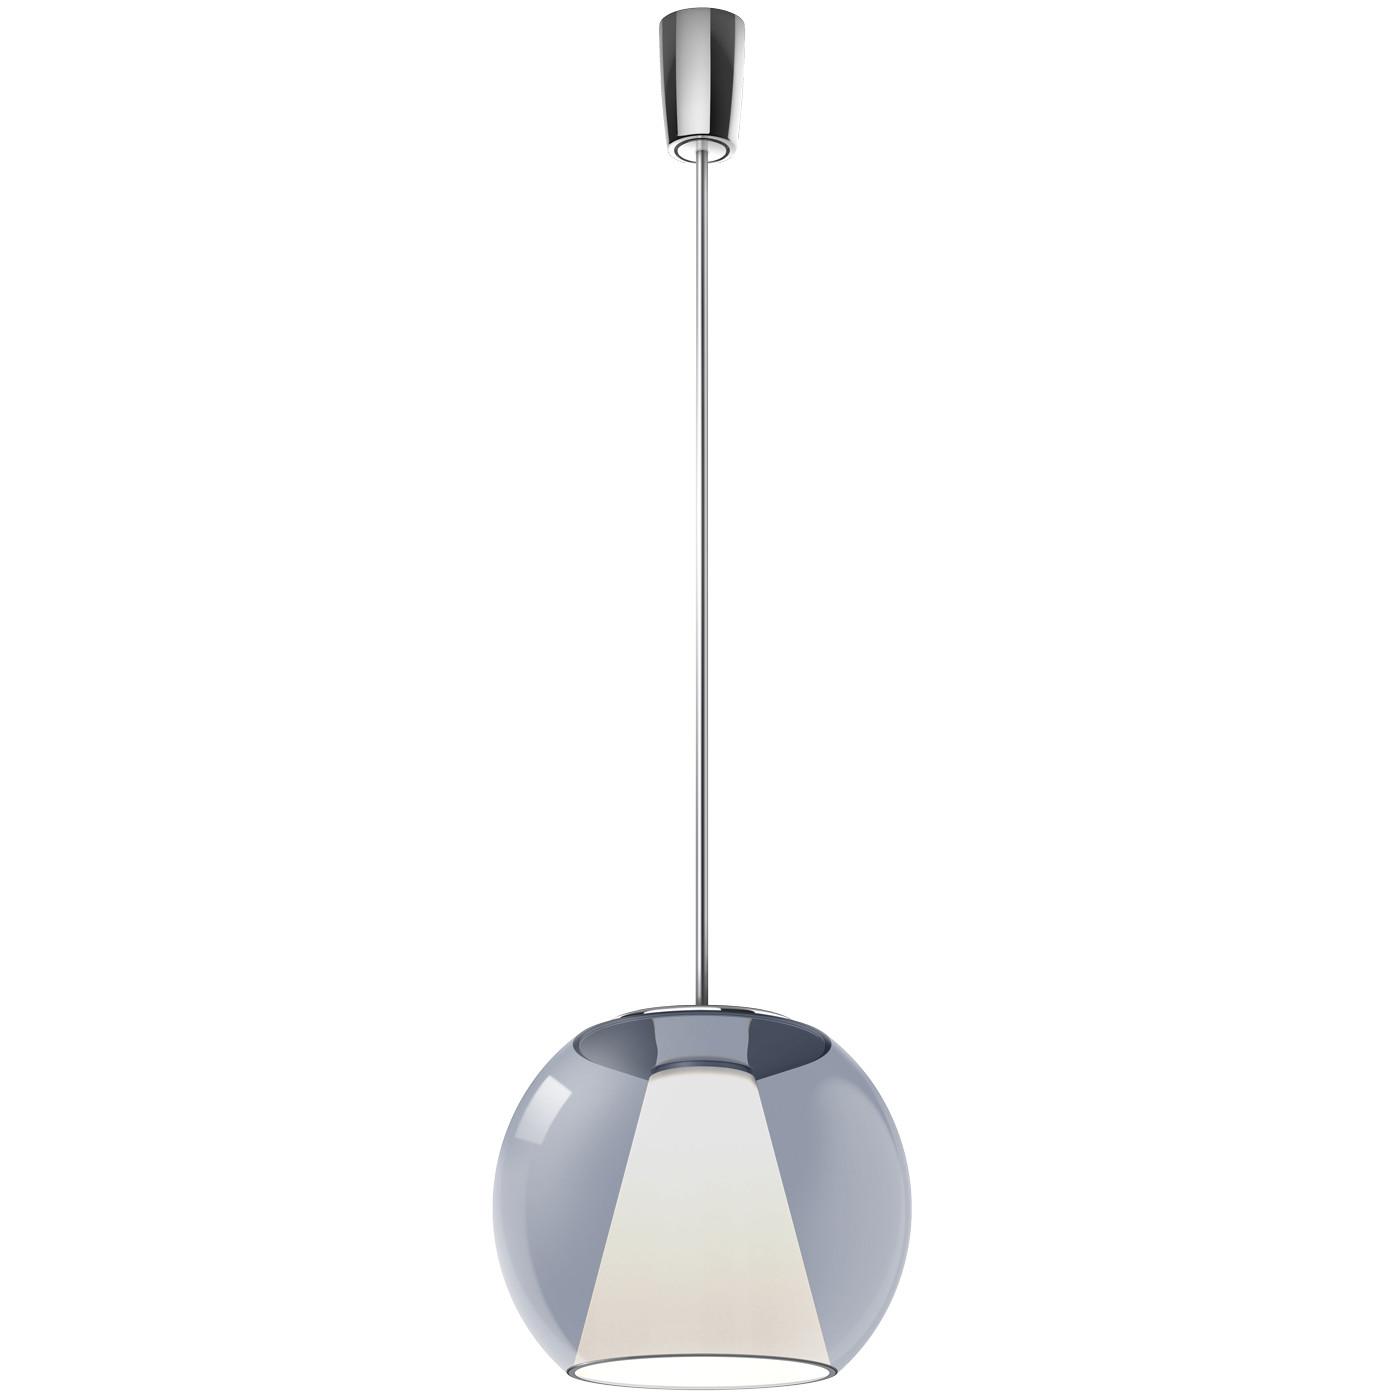 Serien Lighting Draft M Pendant Lamp